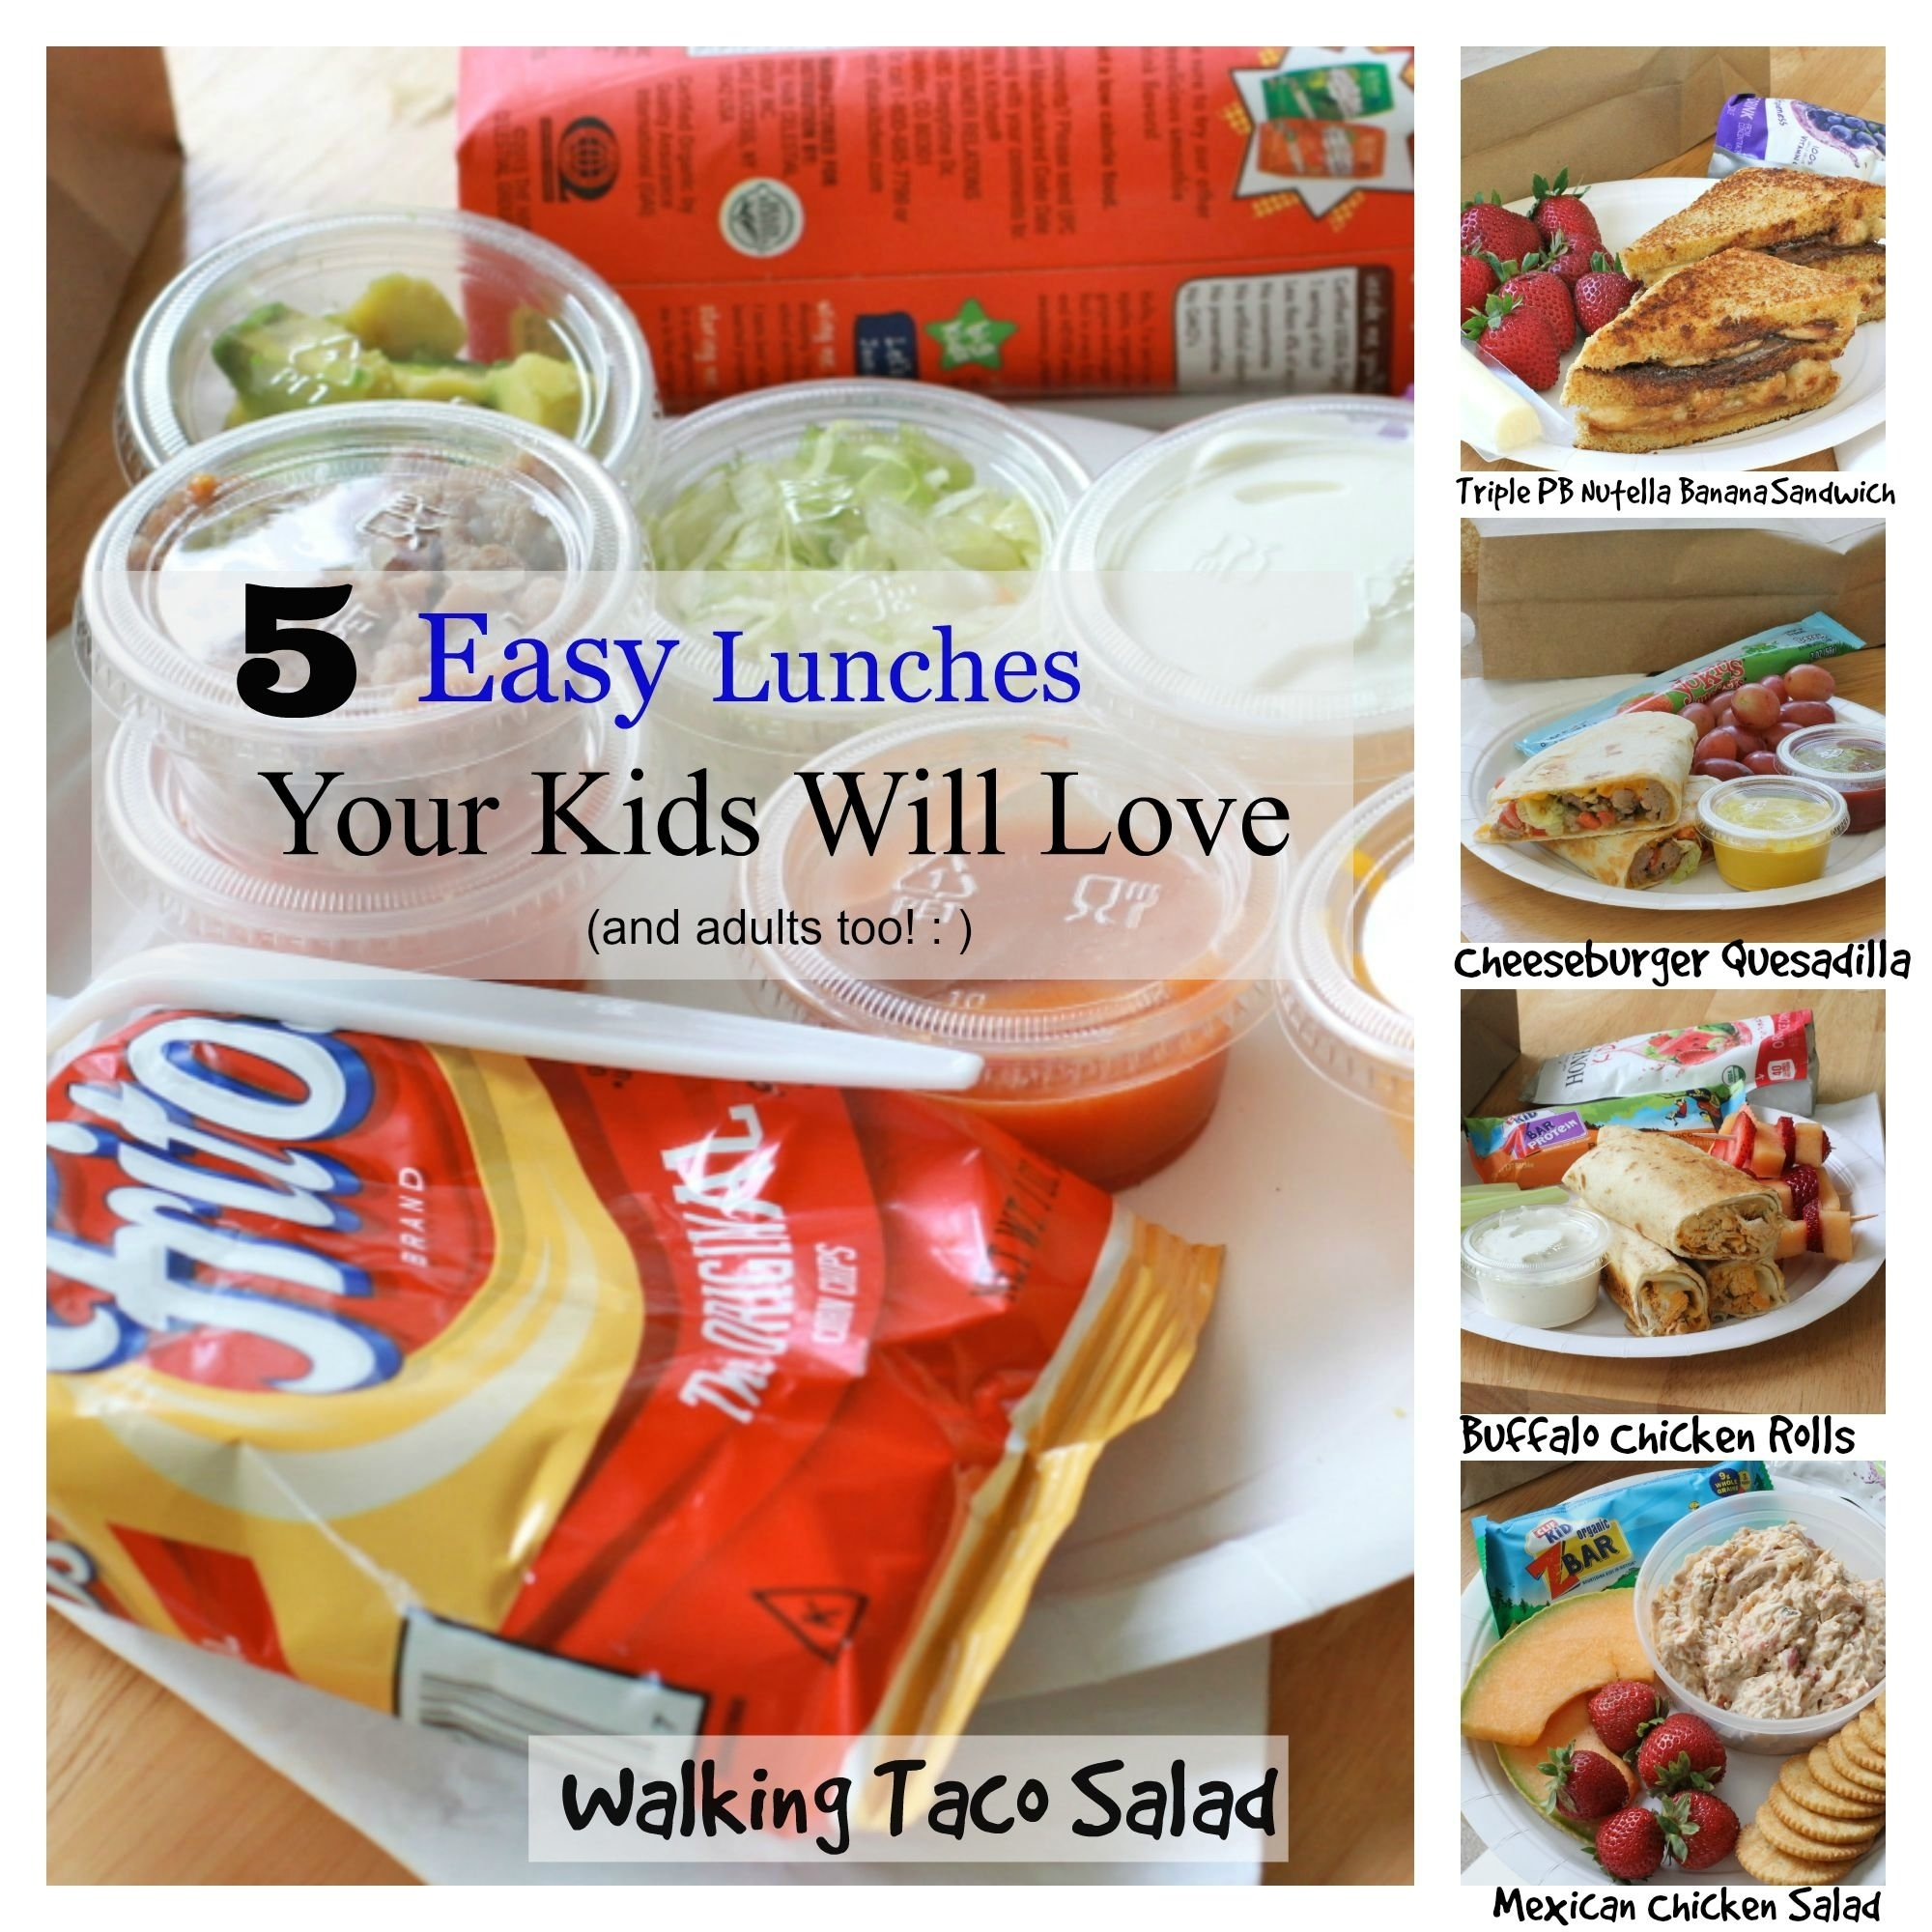 10 Most Popular Lunch Ideas For Kids For School school lunch ideas for kids food and drinks pinterest school 1 2021